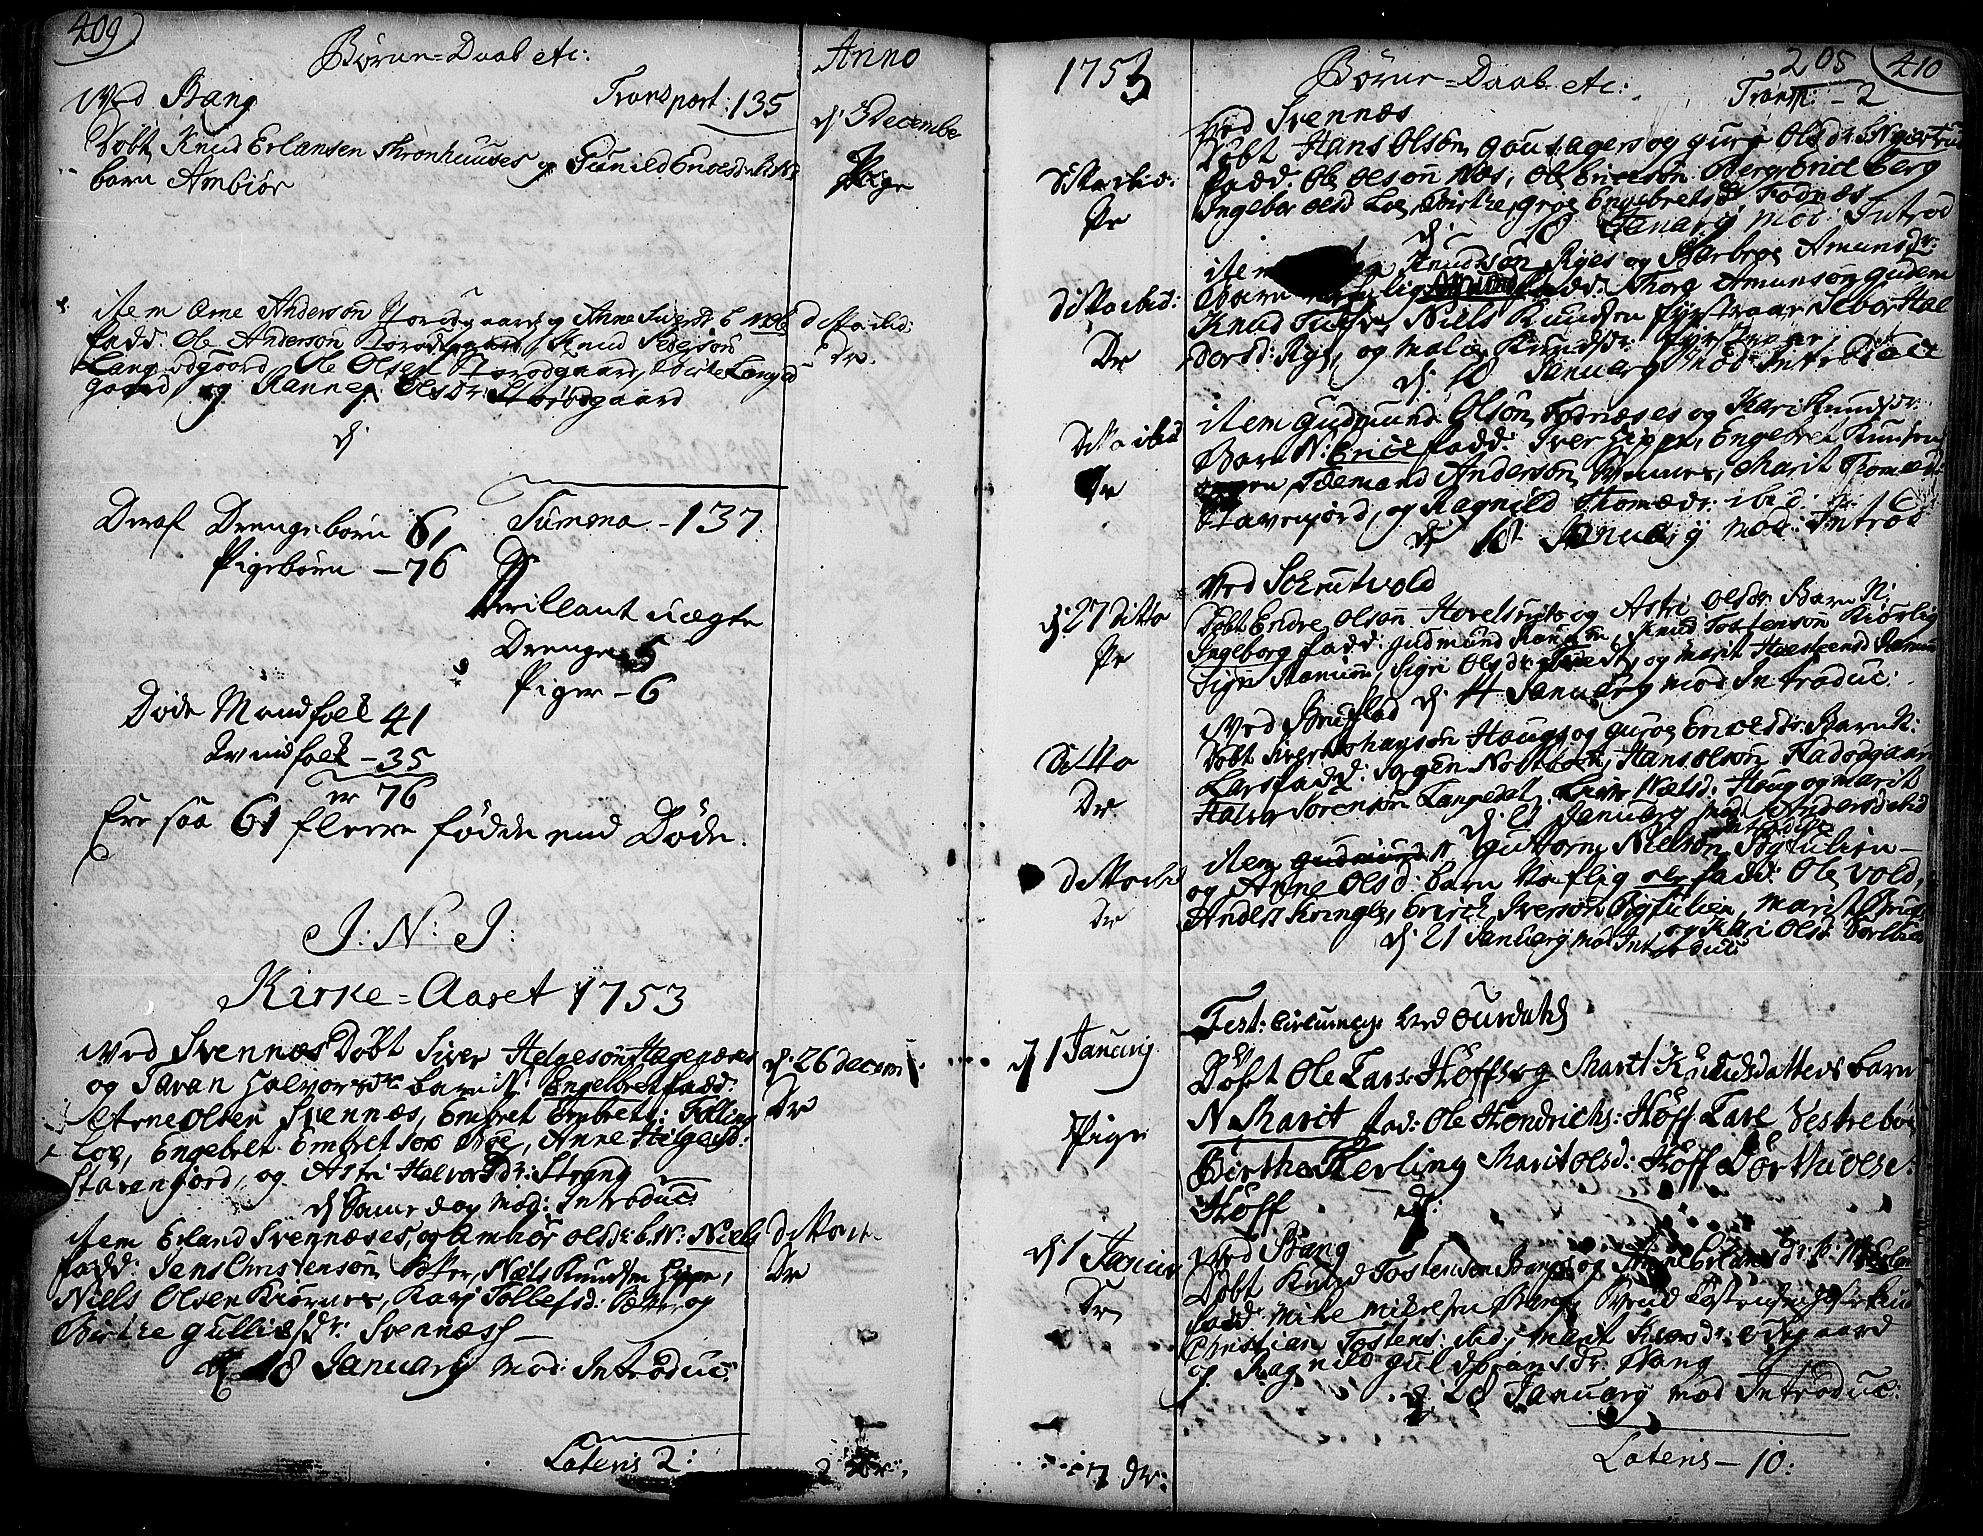 SAH, Aurdal prestekontor, Ministerialbok nr. 4, 1730-1762, s. 409-410